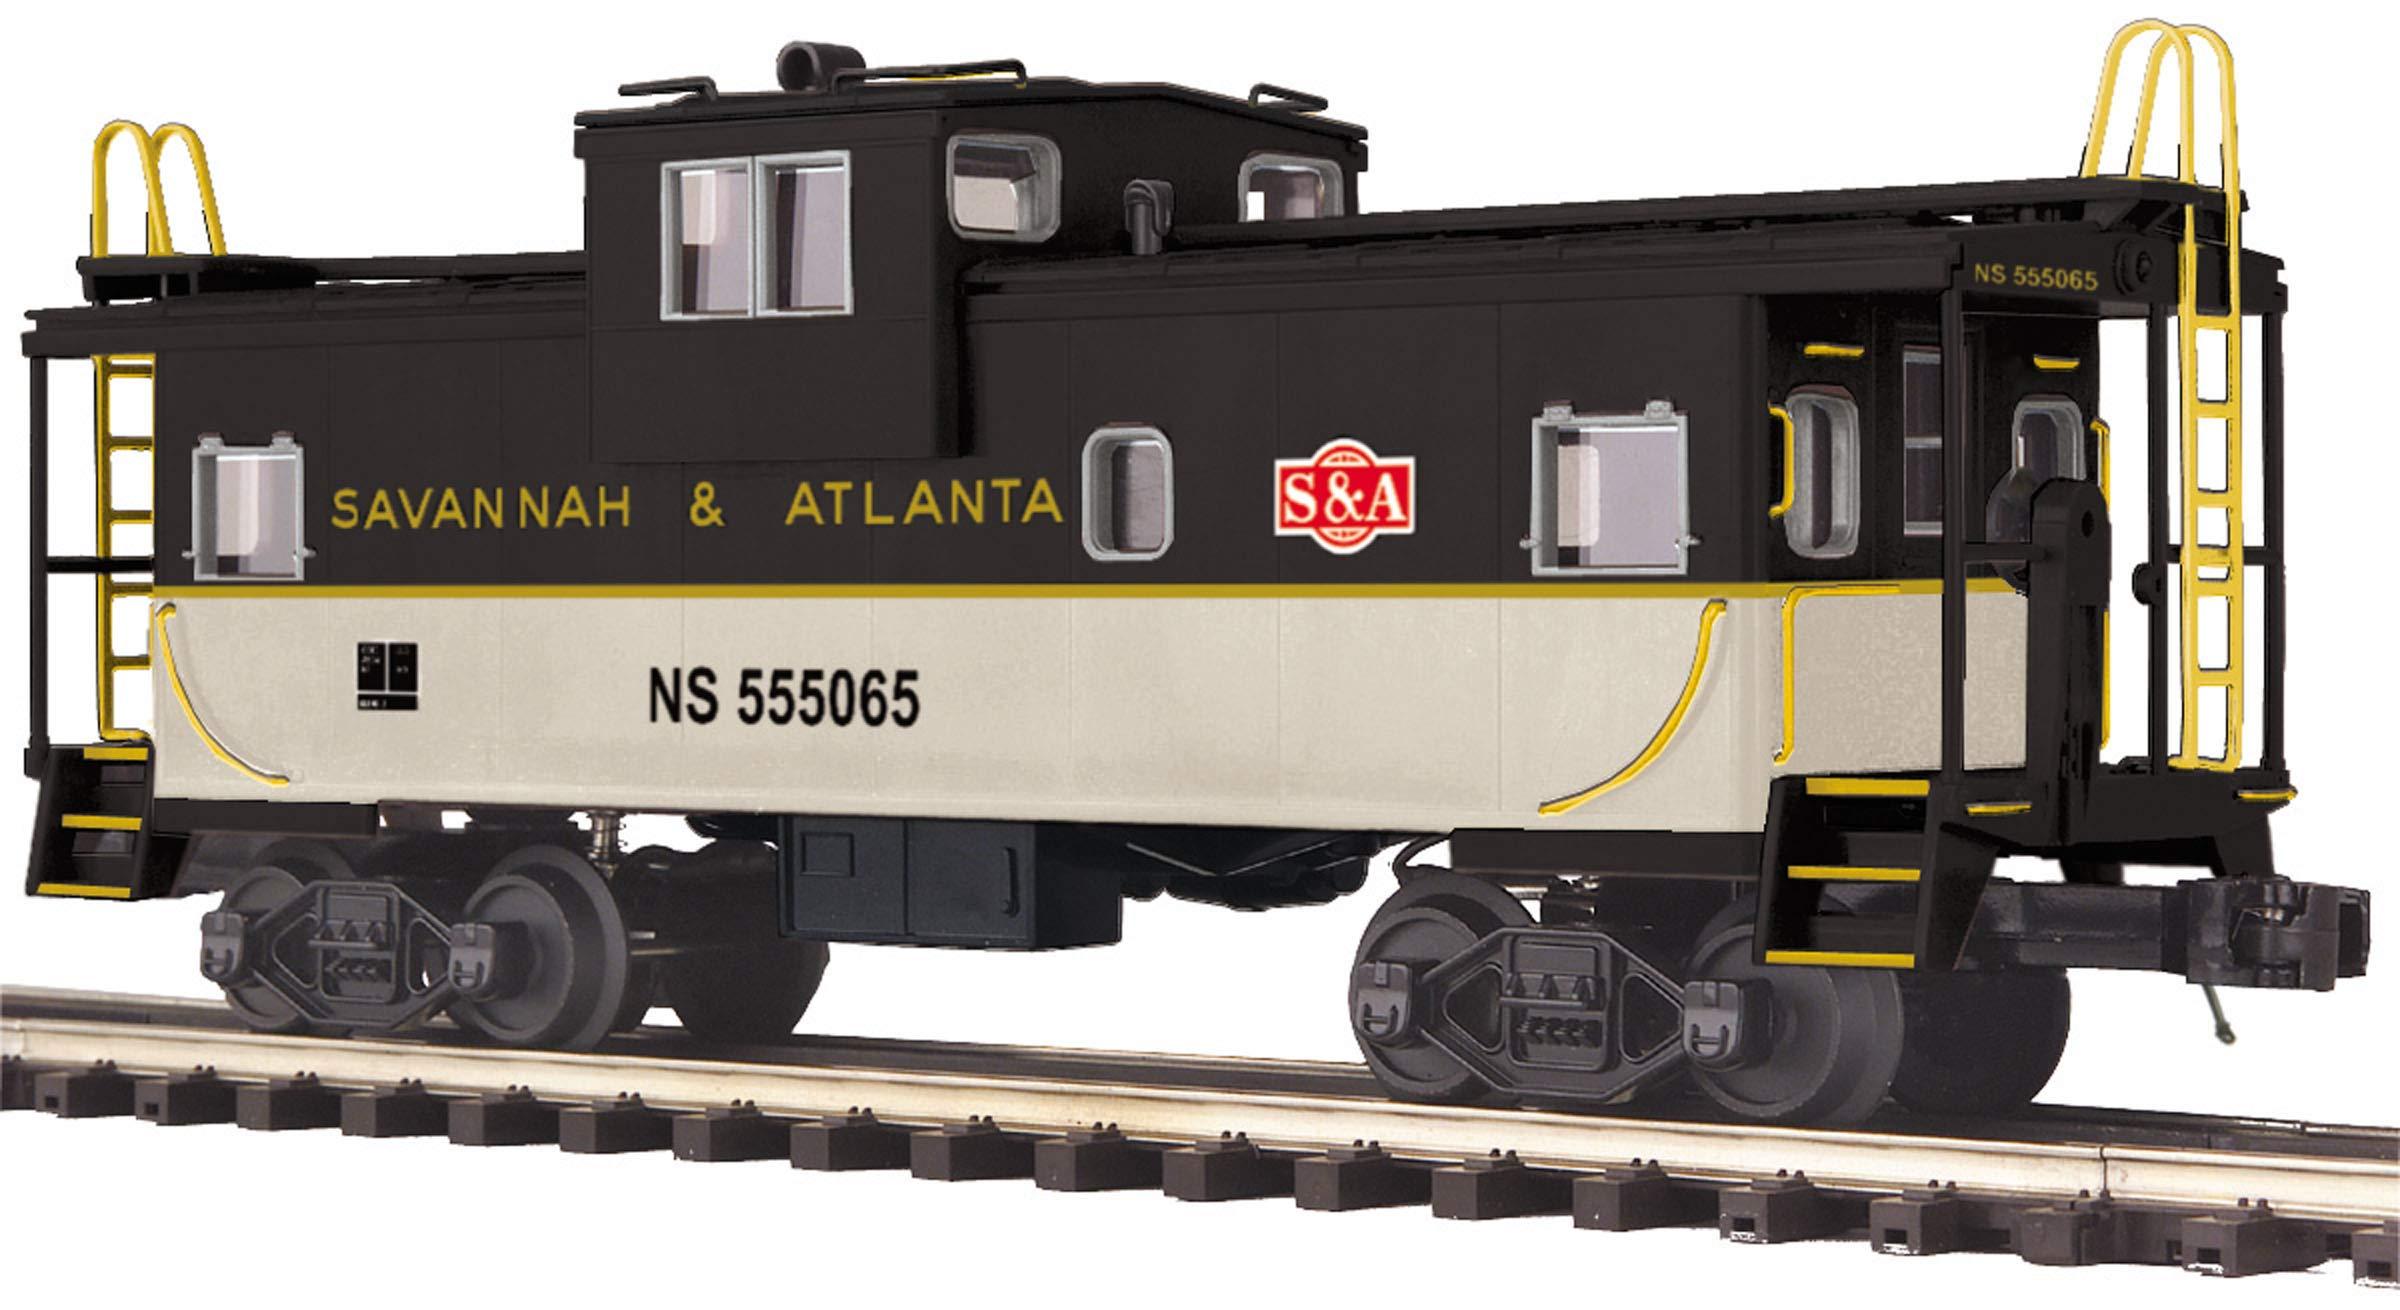 MTH 1:48 O Scale Savannah Atlanta #555065 NS Heritage Caboose #20-91416